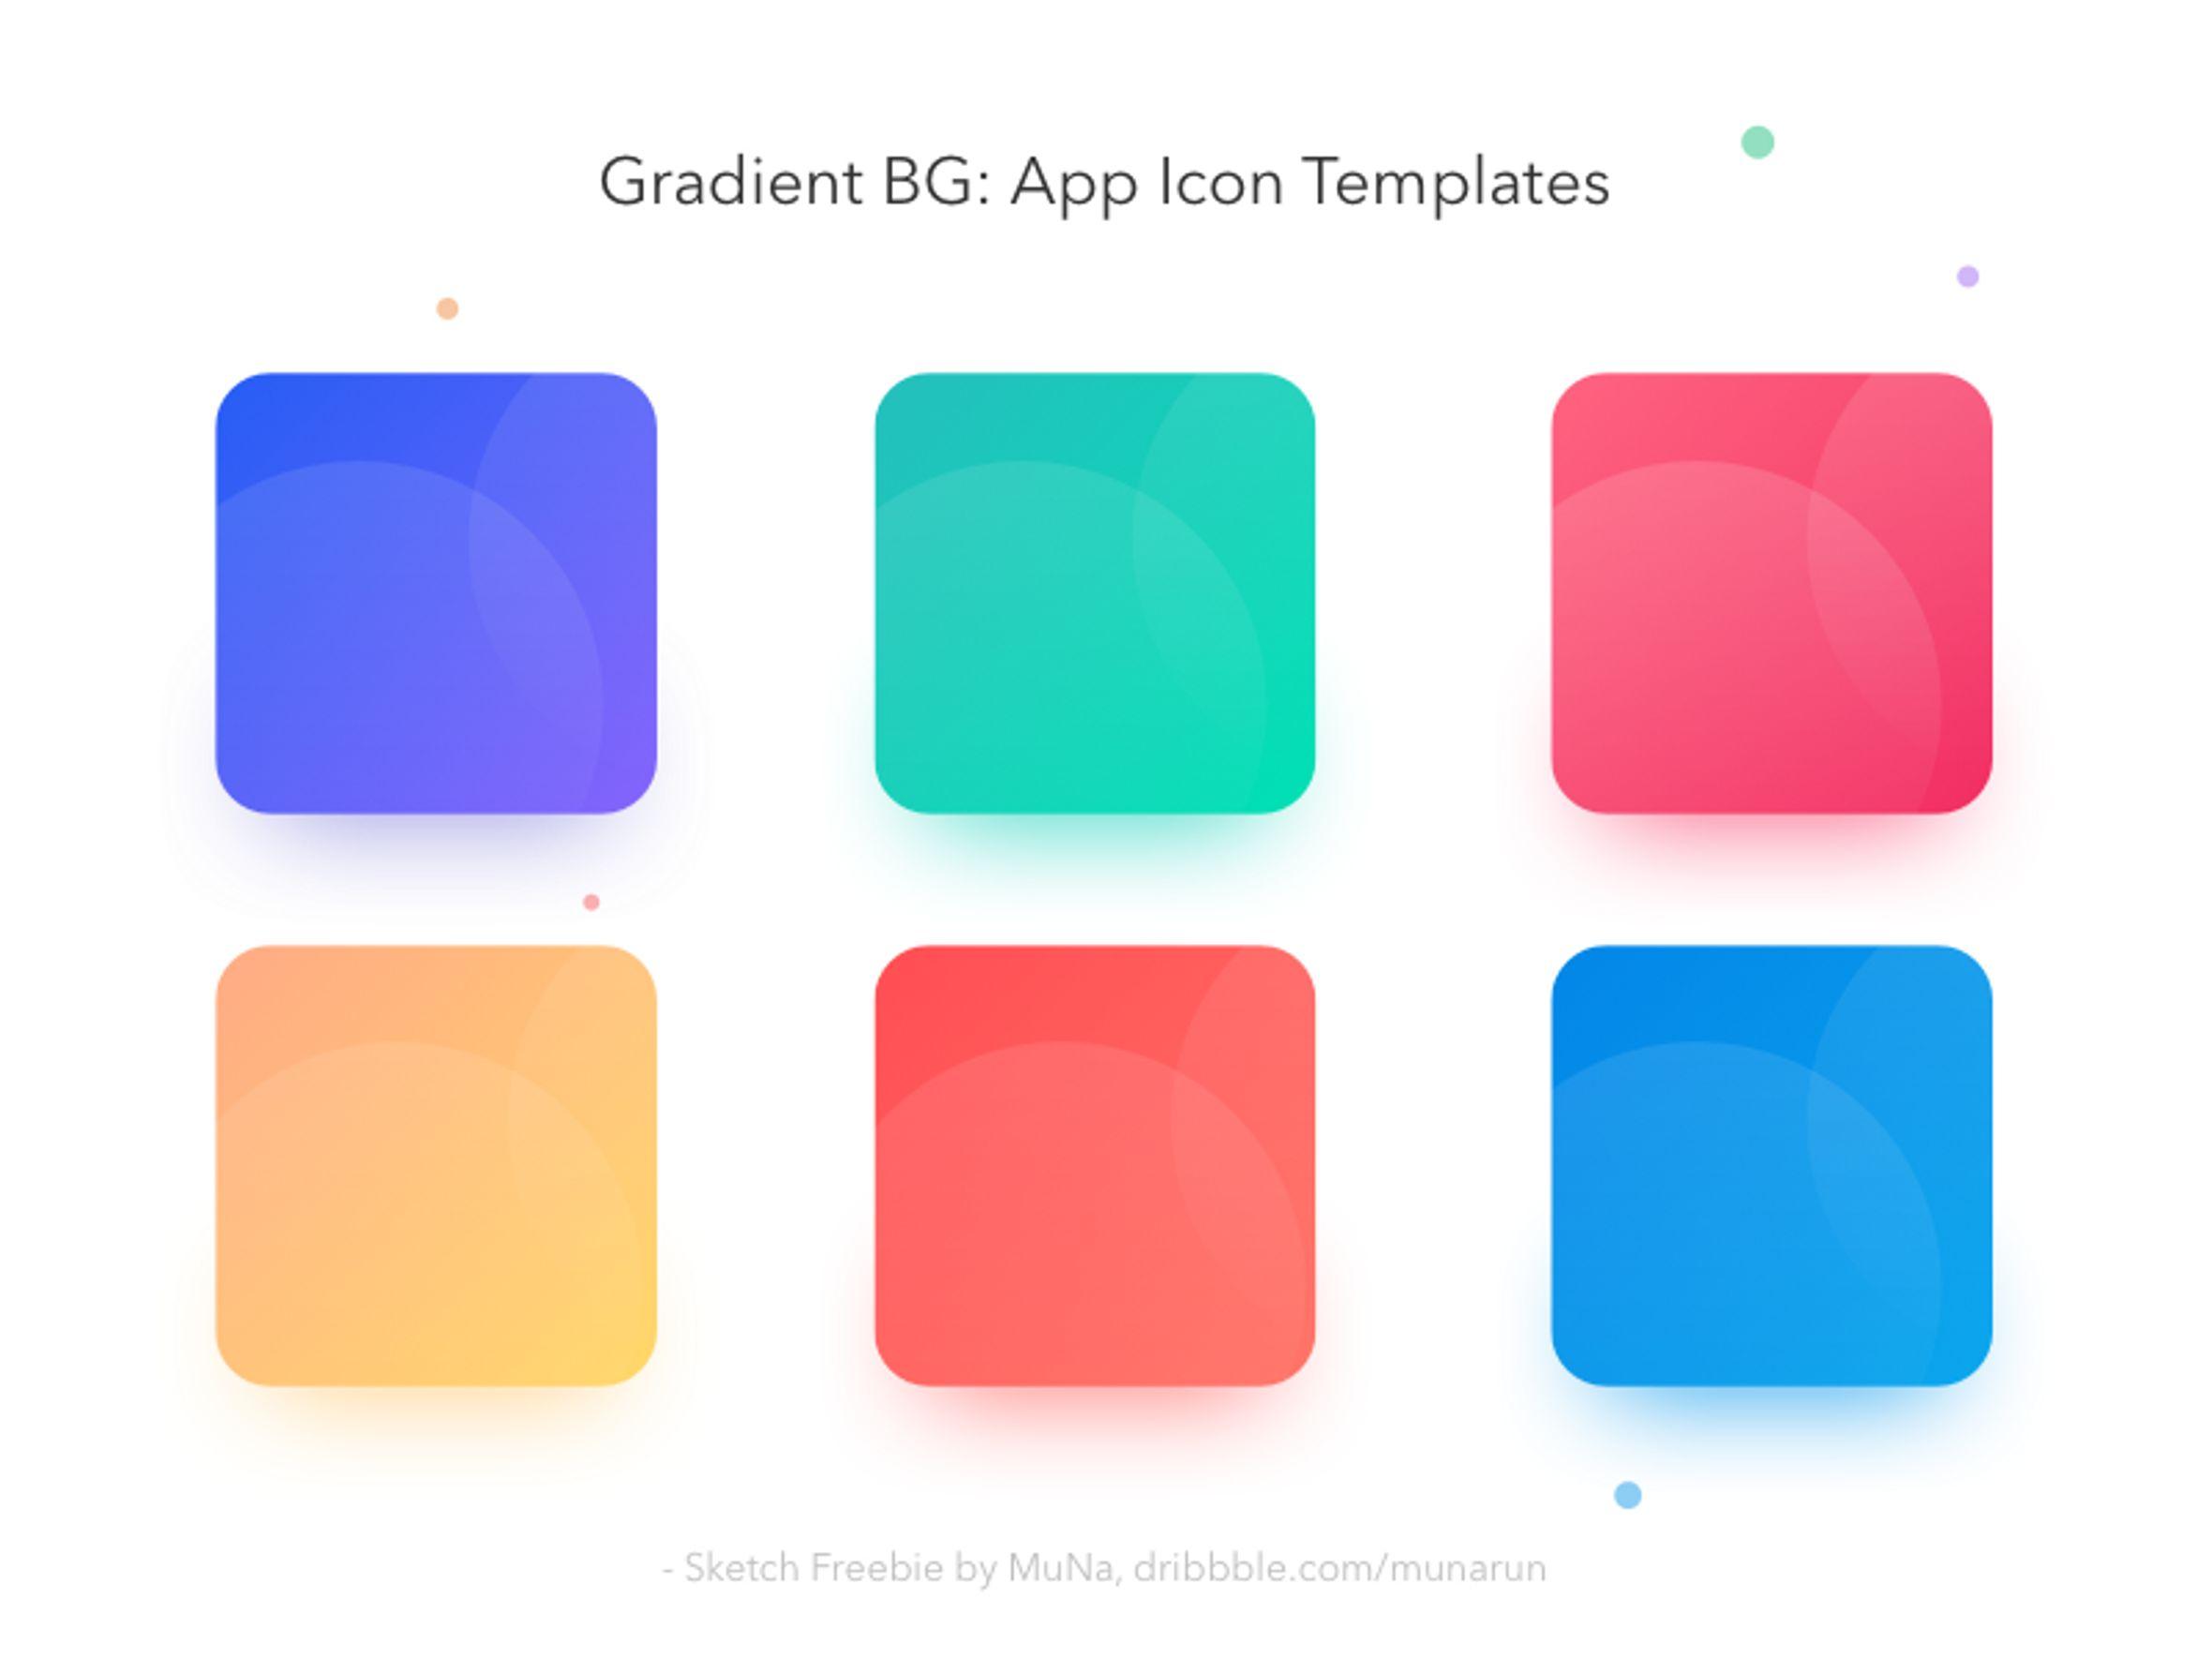 Bestfolios - Gradient BG App icon Templates - Sketch Freebie